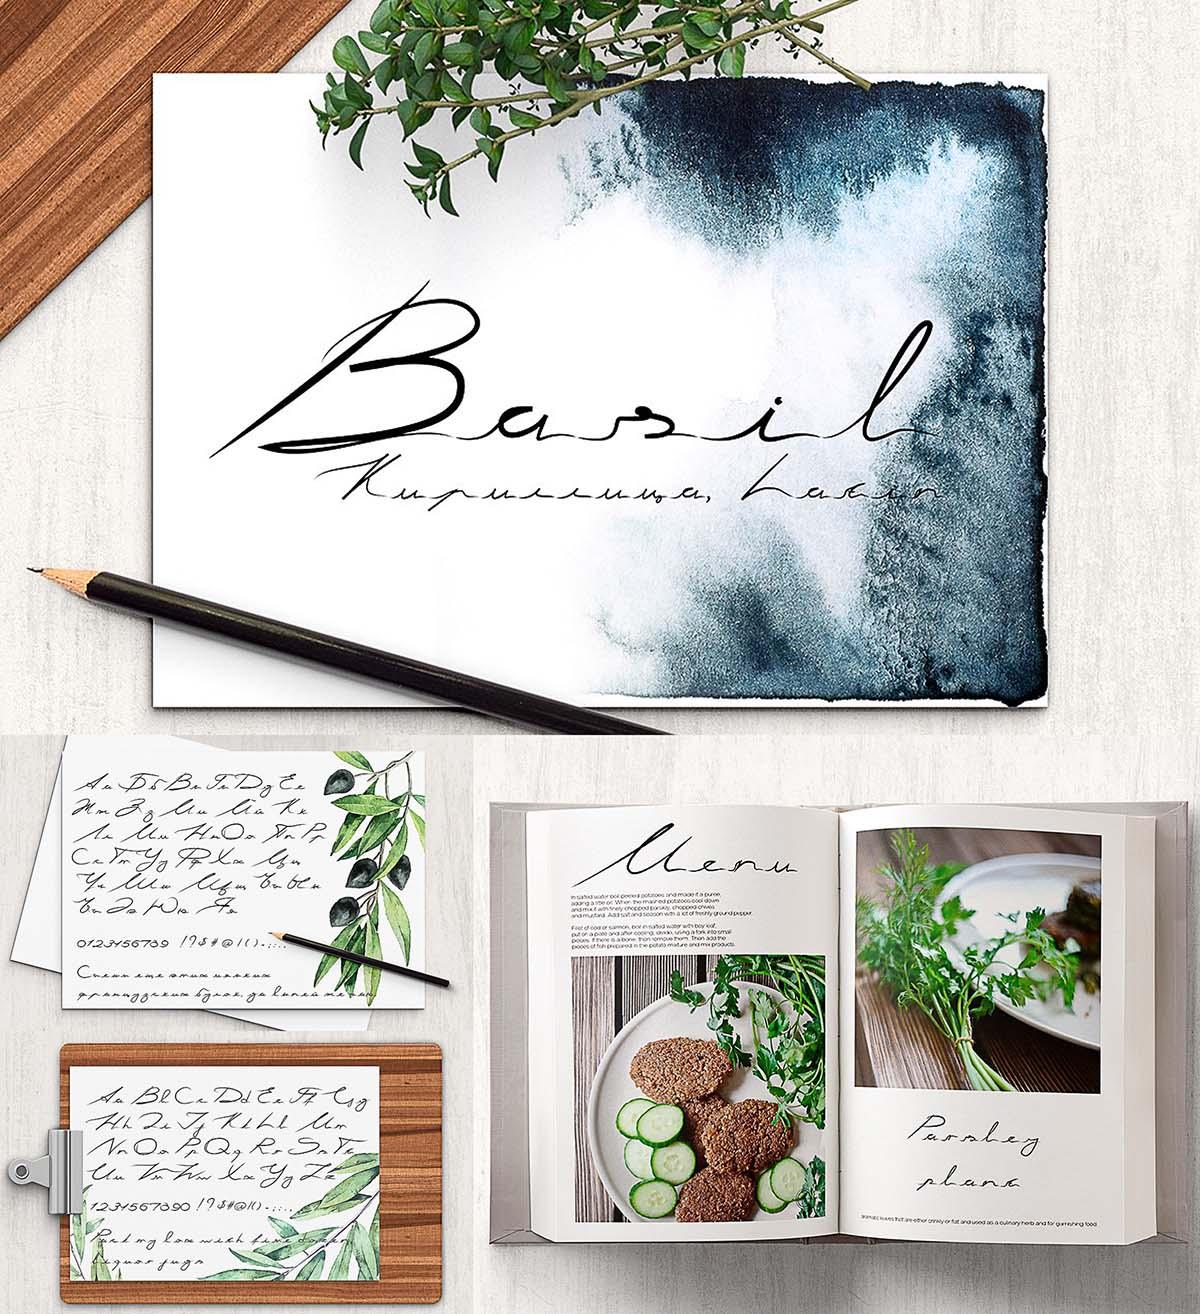 Basil cyrillic font